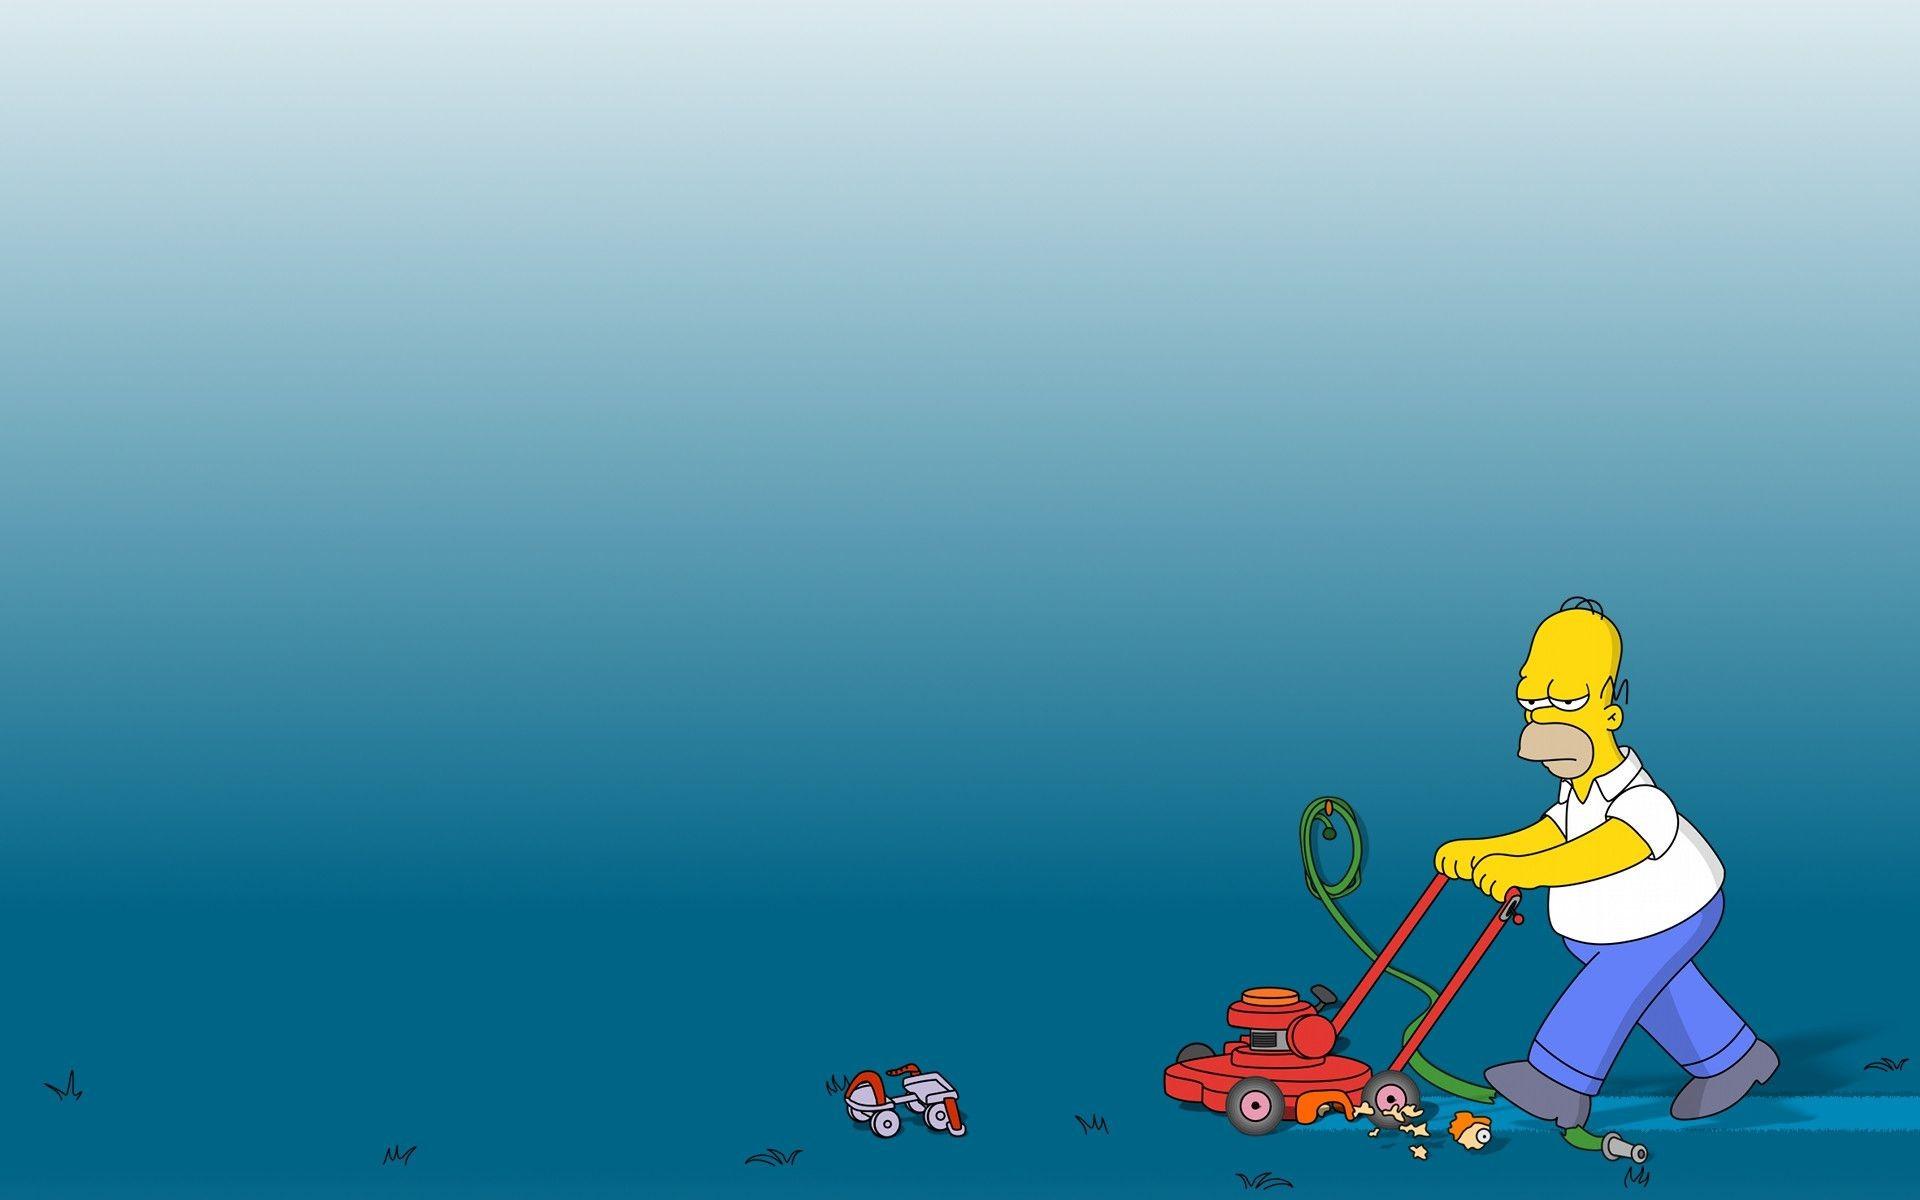 Simpsons Hd Wallpapers - Desktop Wallpaper Simpsons - HD Wallpaper